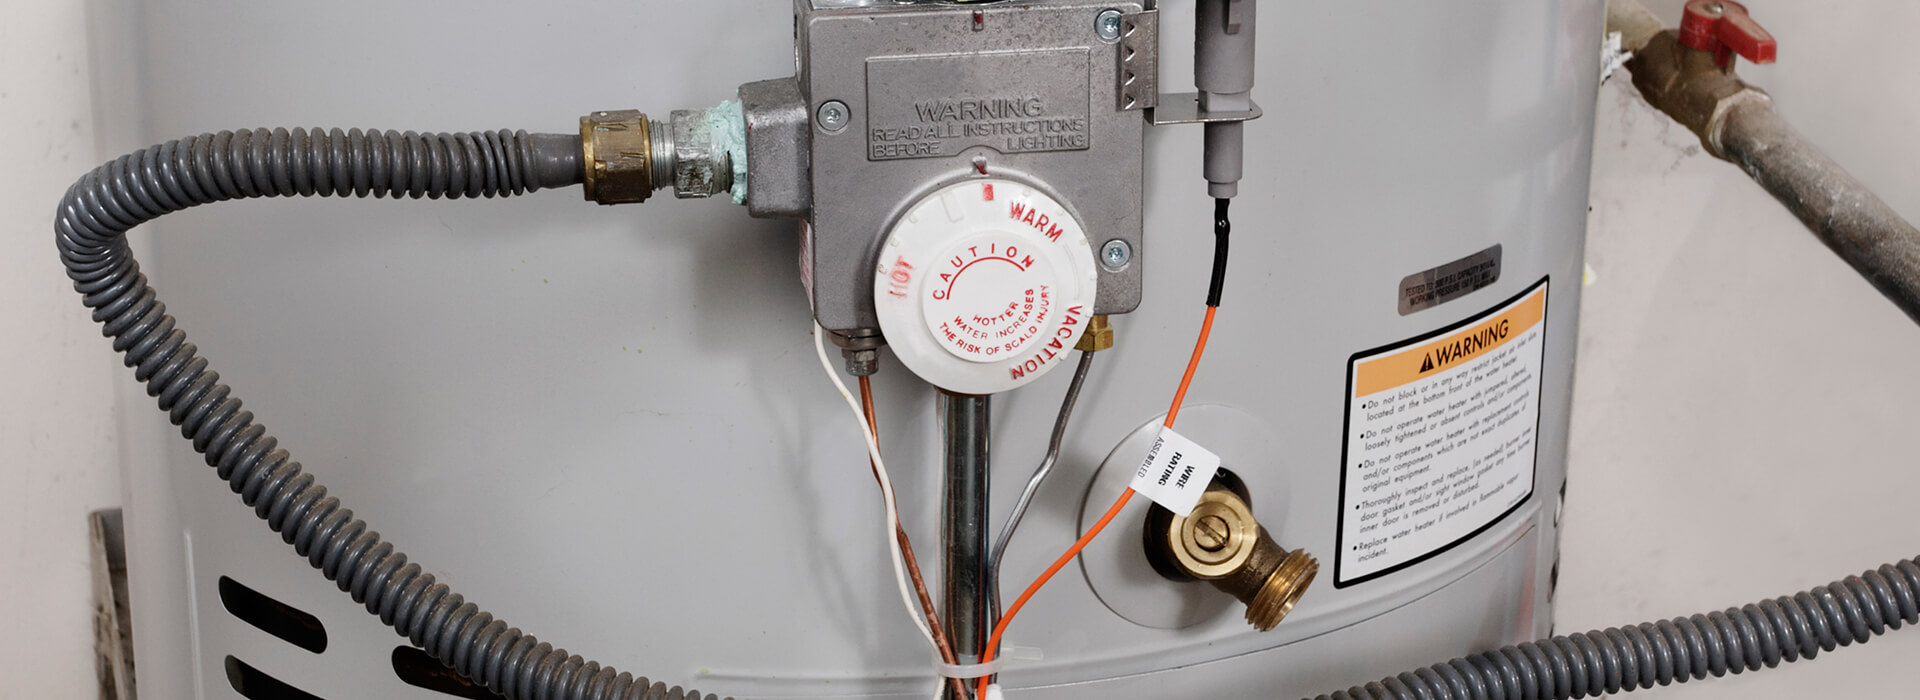 Water Heater Repair | Plumber in Birmingham, AL | Plumbing Professionals